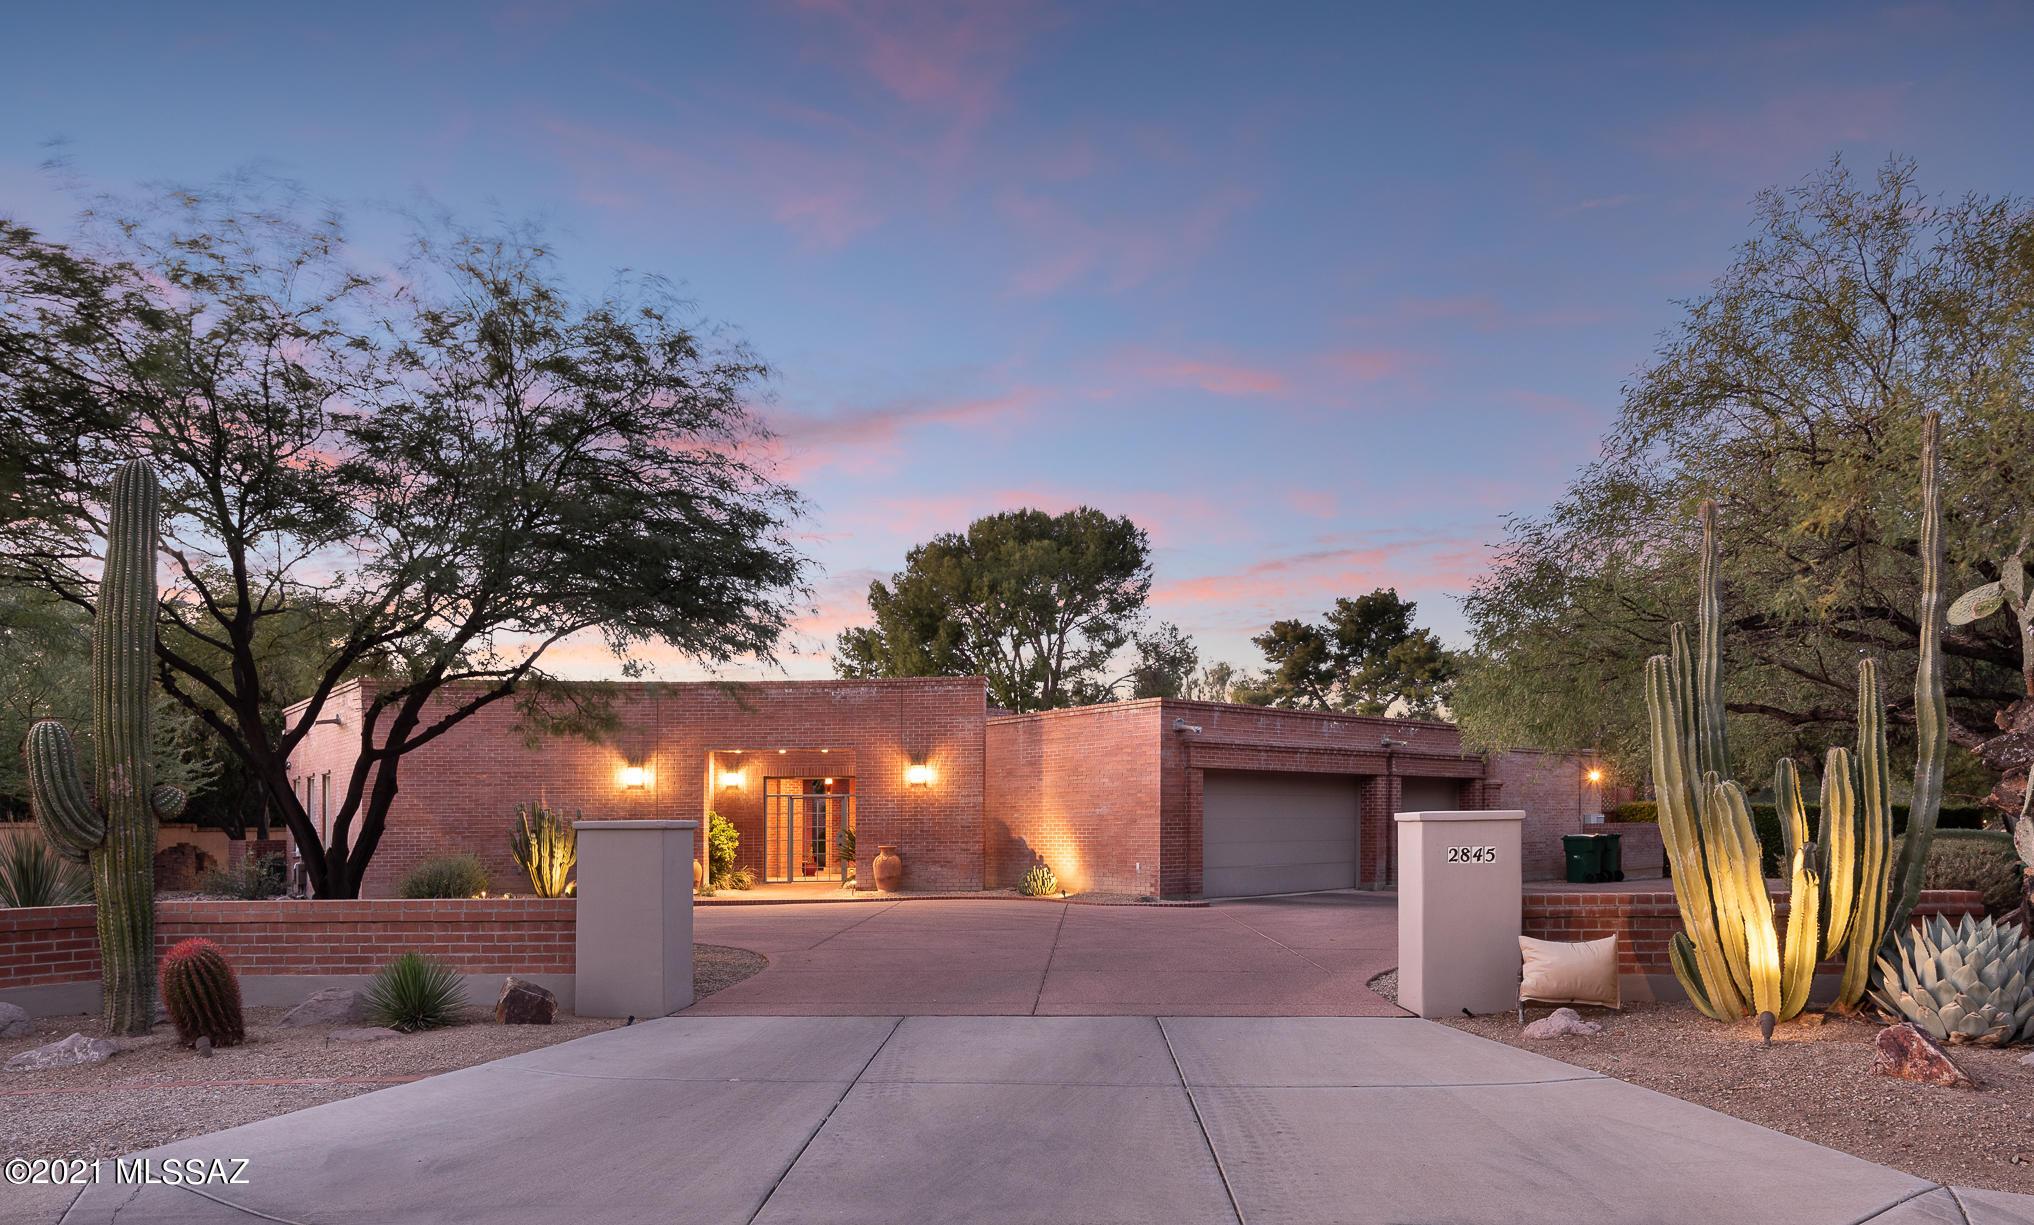 Photo of 2845 N Santa Ynez Place, Tucson, AZ 85715